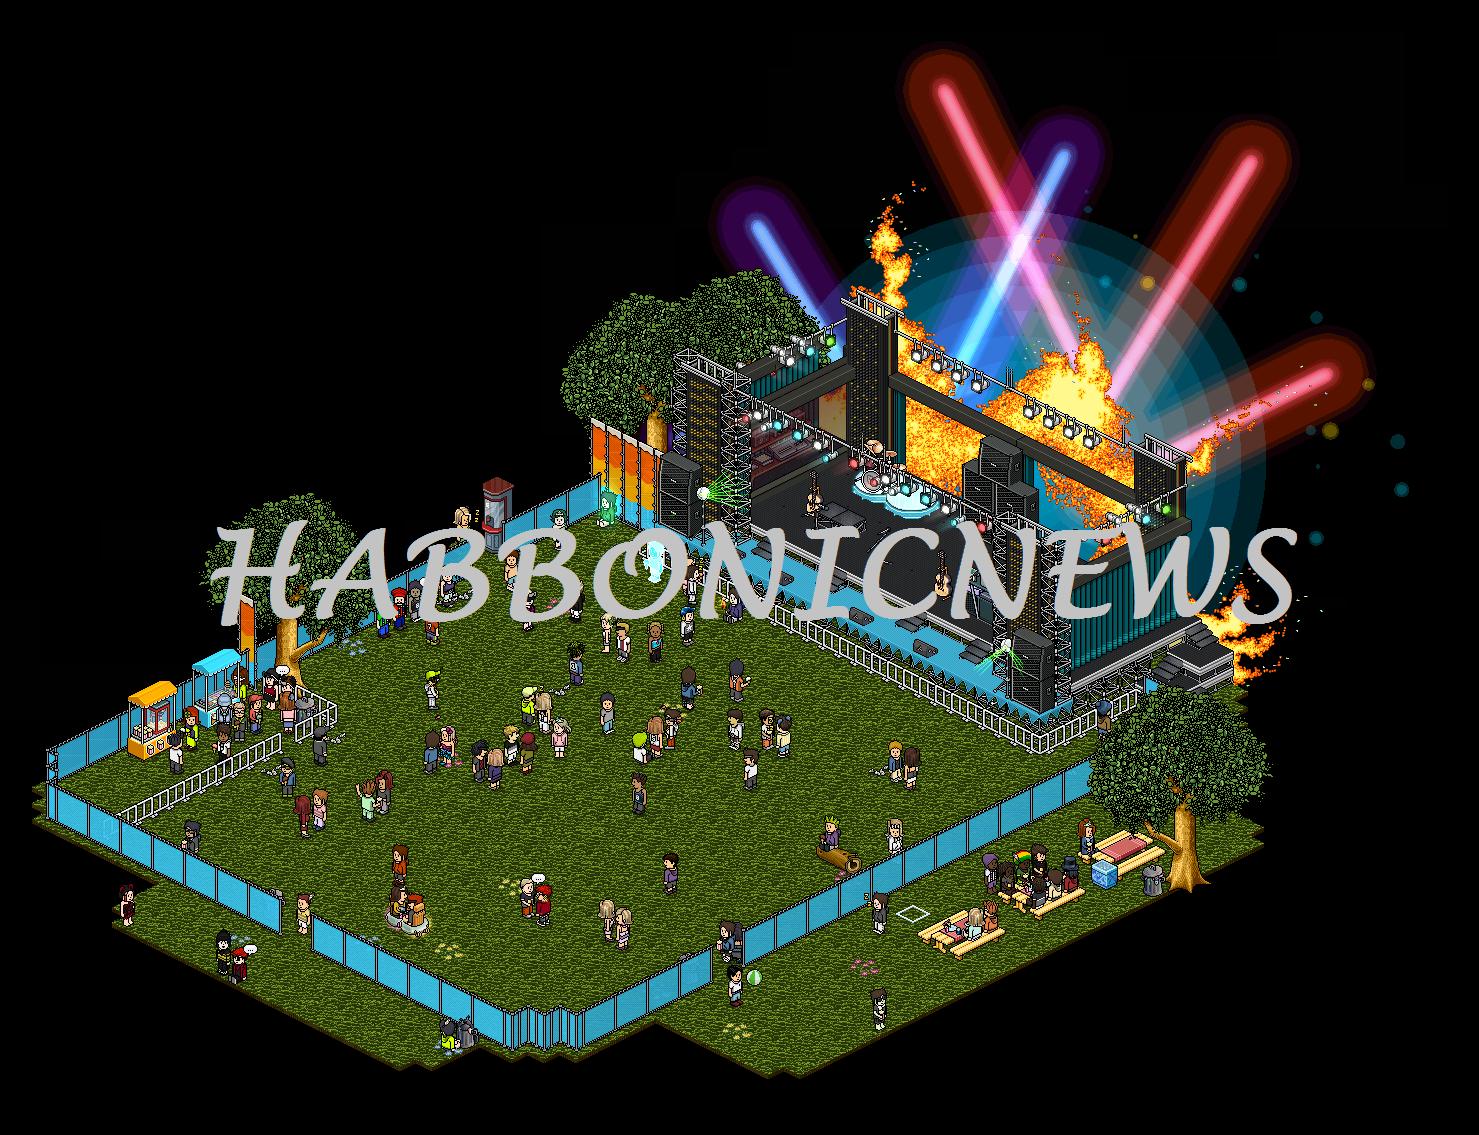 Habbonicnews ~ Blog HabbonicNews 1,2,3 É A HORA DE AGITAR